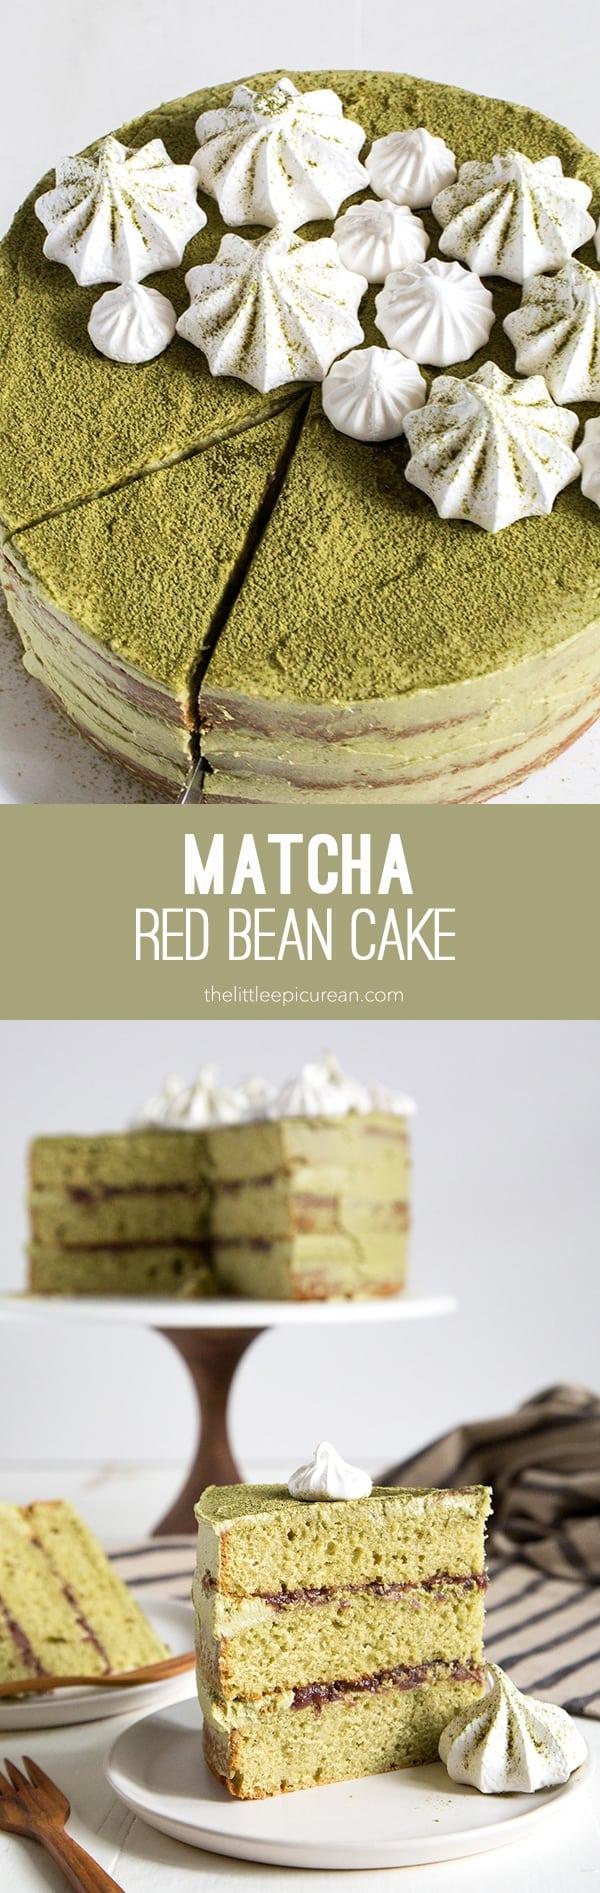 Matcha Red Bean Cake